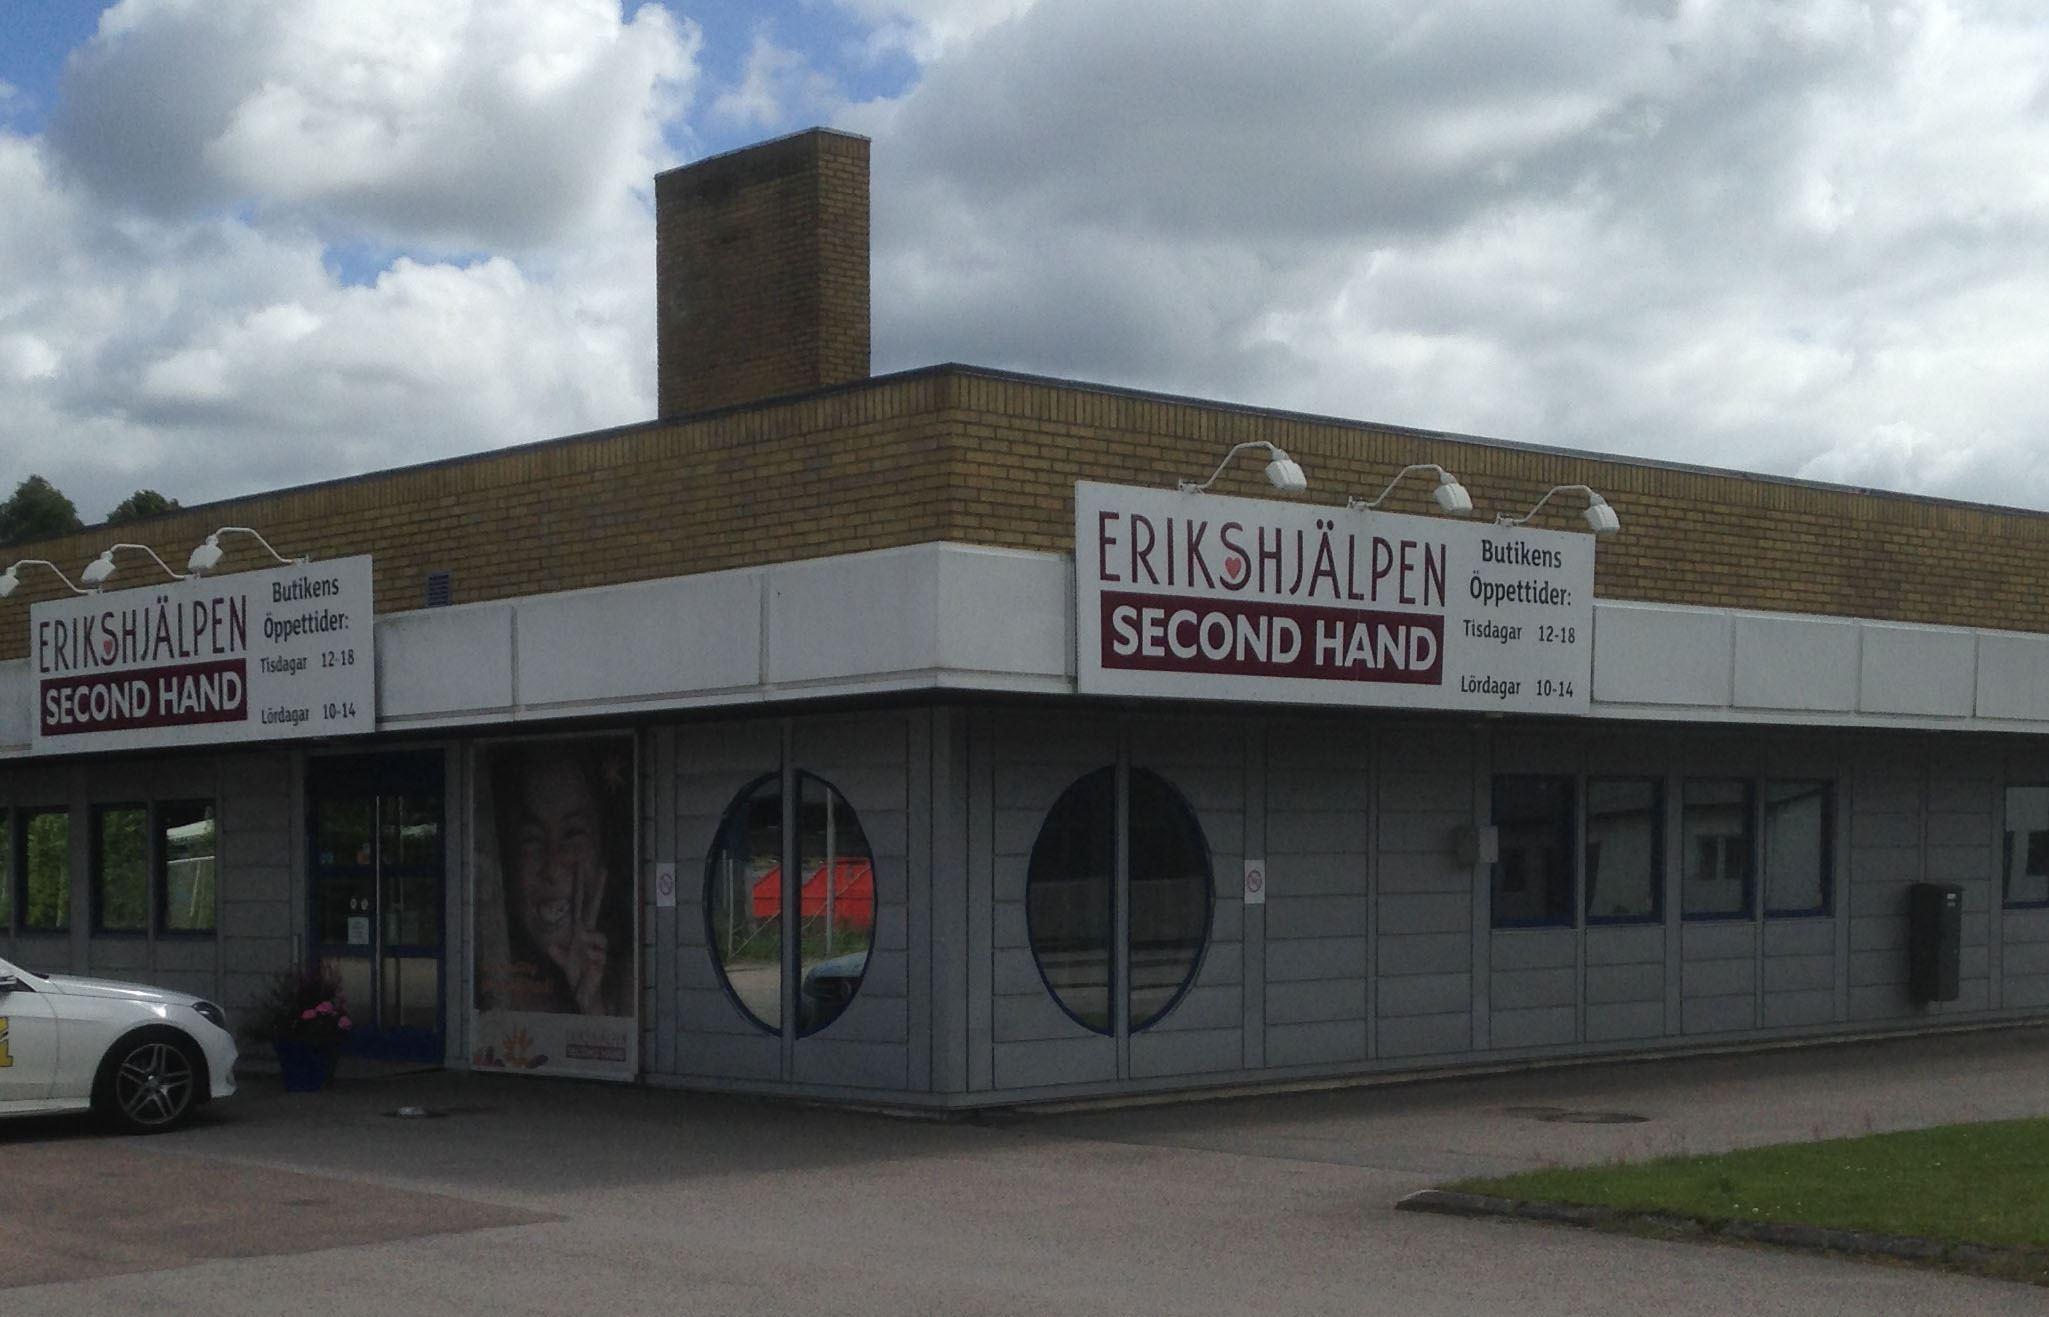 Erikshjälpen Second Hand